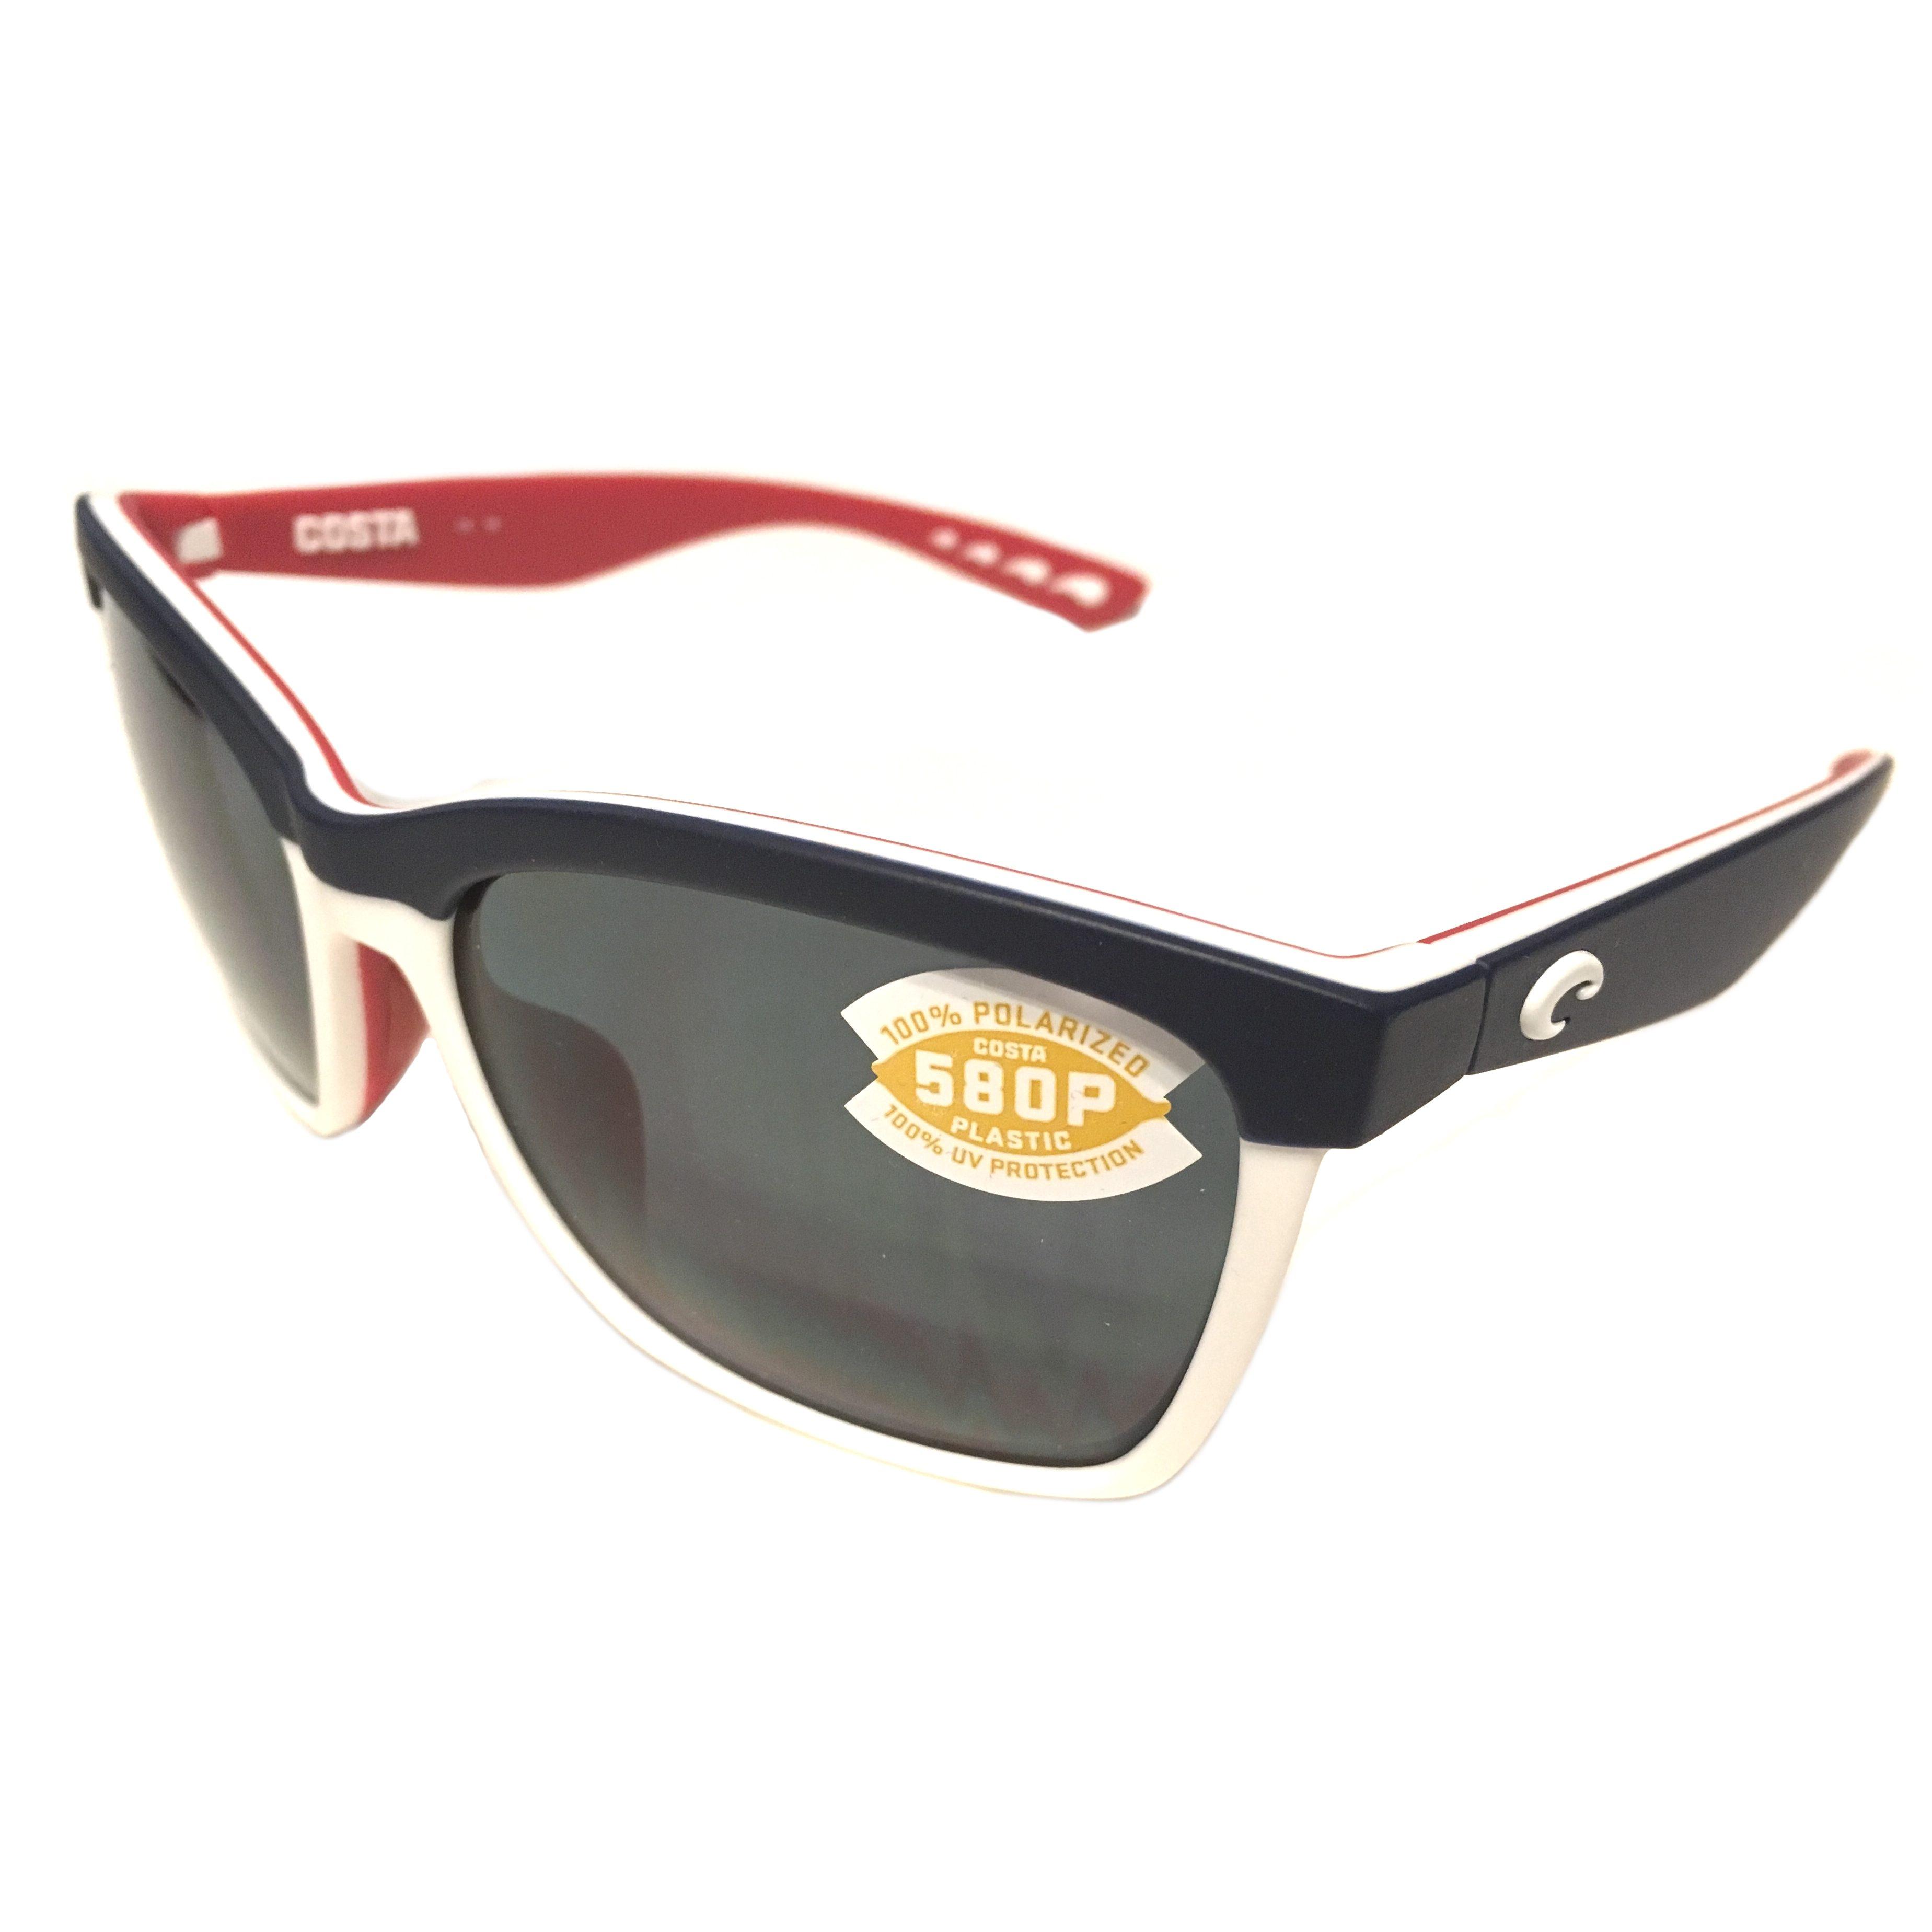 2d721270e12 Costa Del Mar Anaa Sunglasses – USA Red White Blue Frame – Polarized Gray  Lens 580P